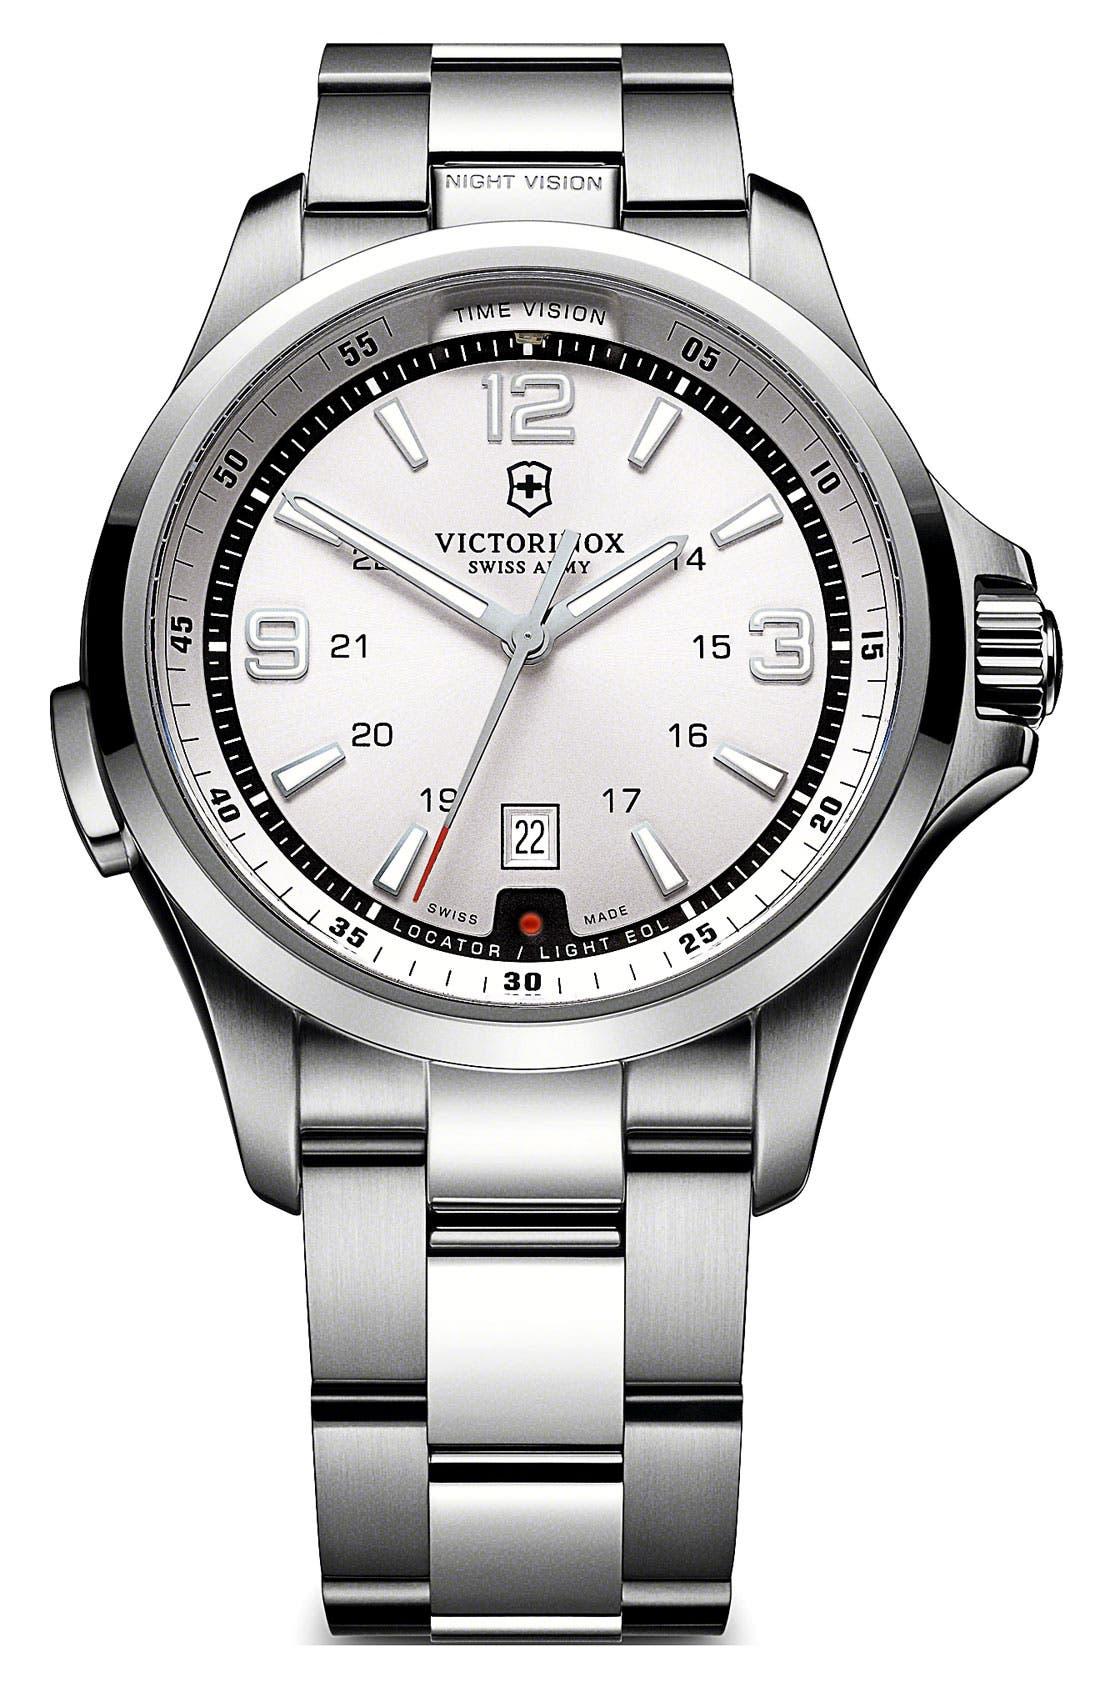 Alternate Image 1 Selected - Victorinox Swiss Army® 'Night Vision' Bracelet Watch, 42mm